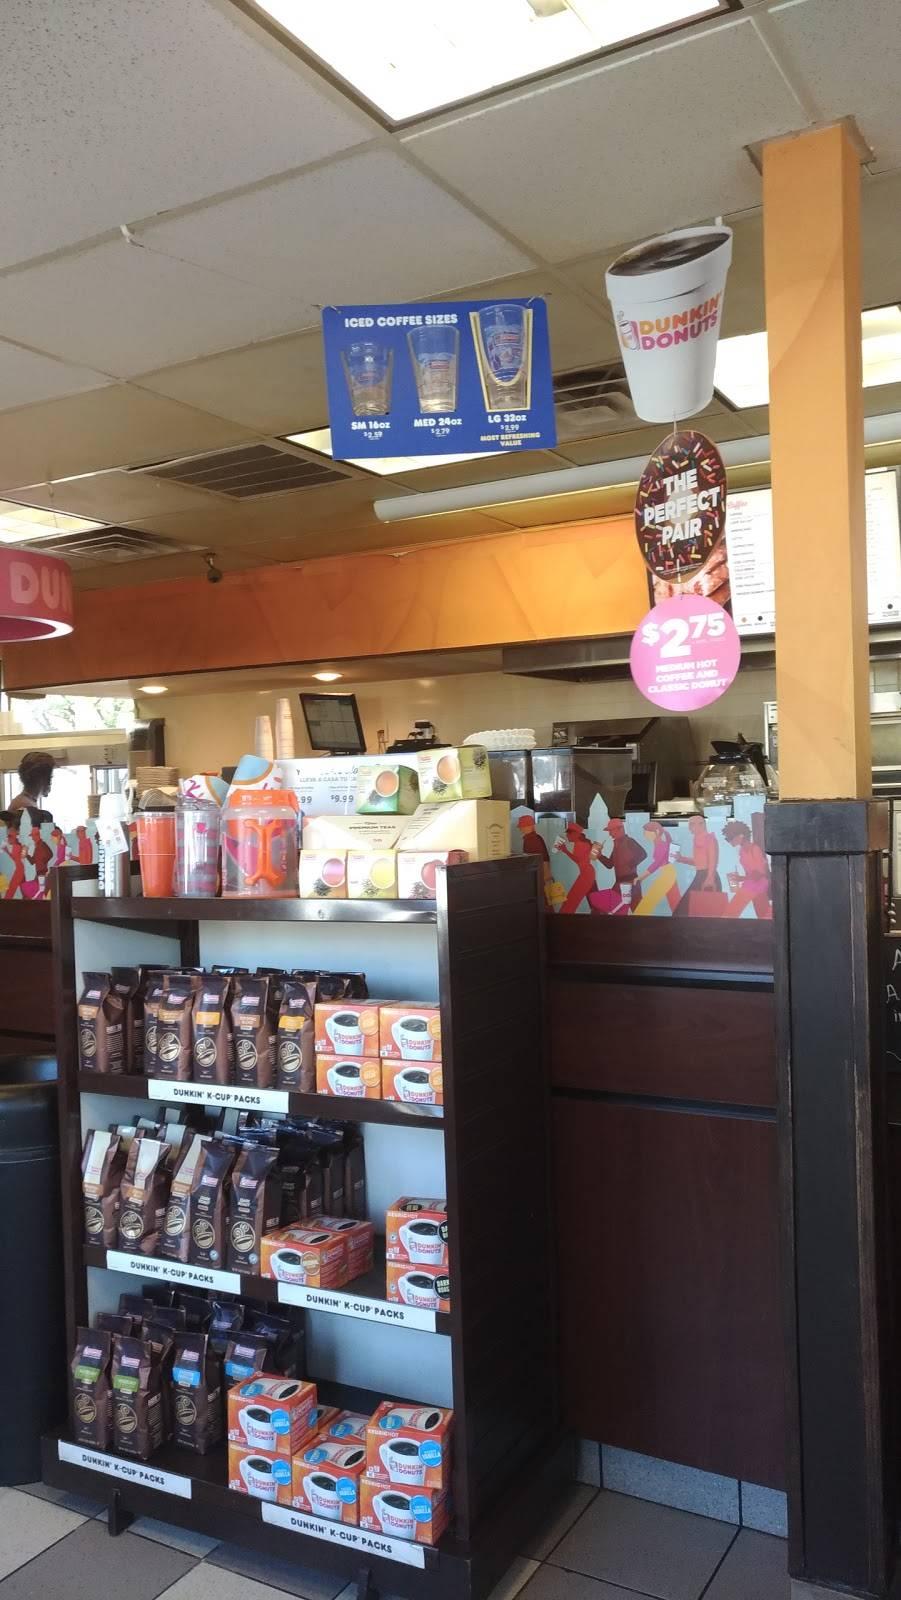 Dunkin Donuts | cafe | 402 Grand St #436, Jersey City, NJ 07302, USA | 2013603444 OR +1 201-360-3444